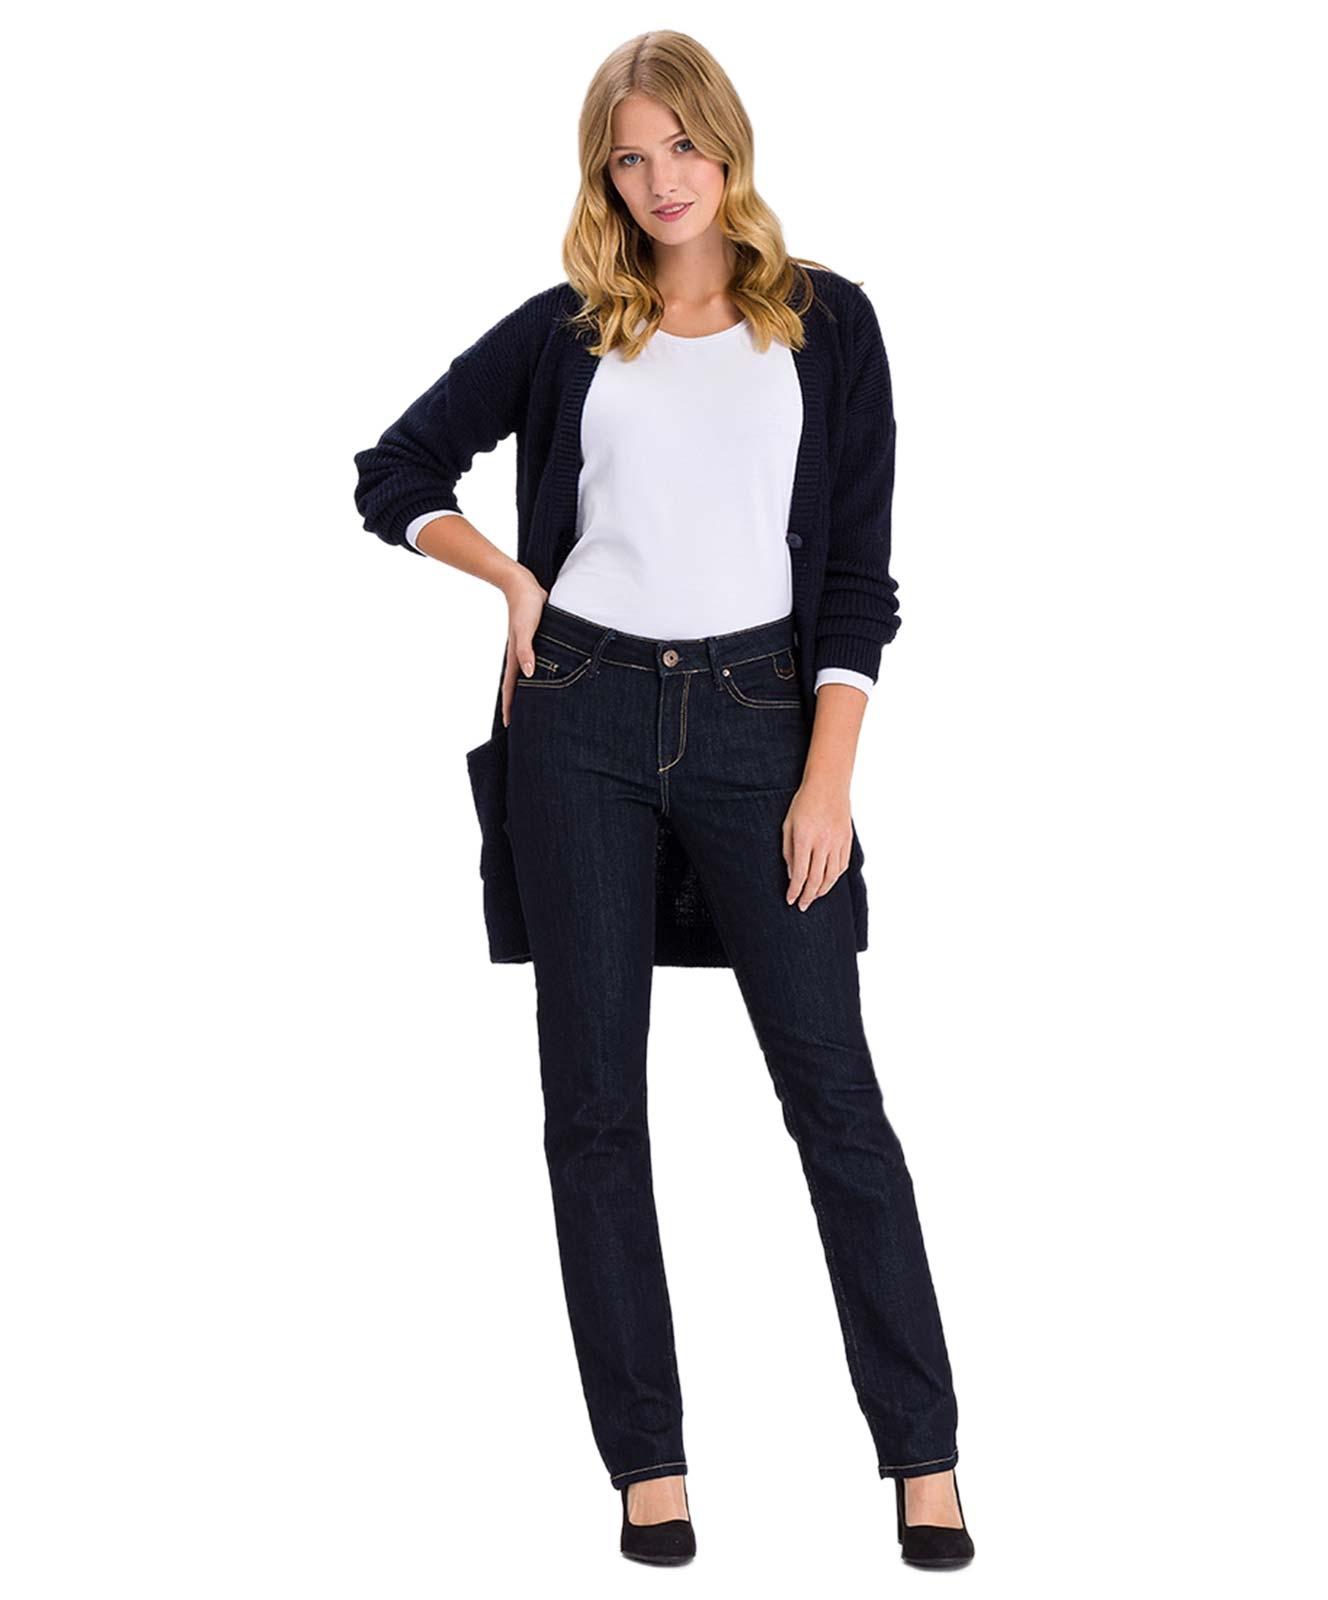 Hosen - Cross Straight Leg Jeans Rose in Deep Blue  - Onlineshop Jeans Meile